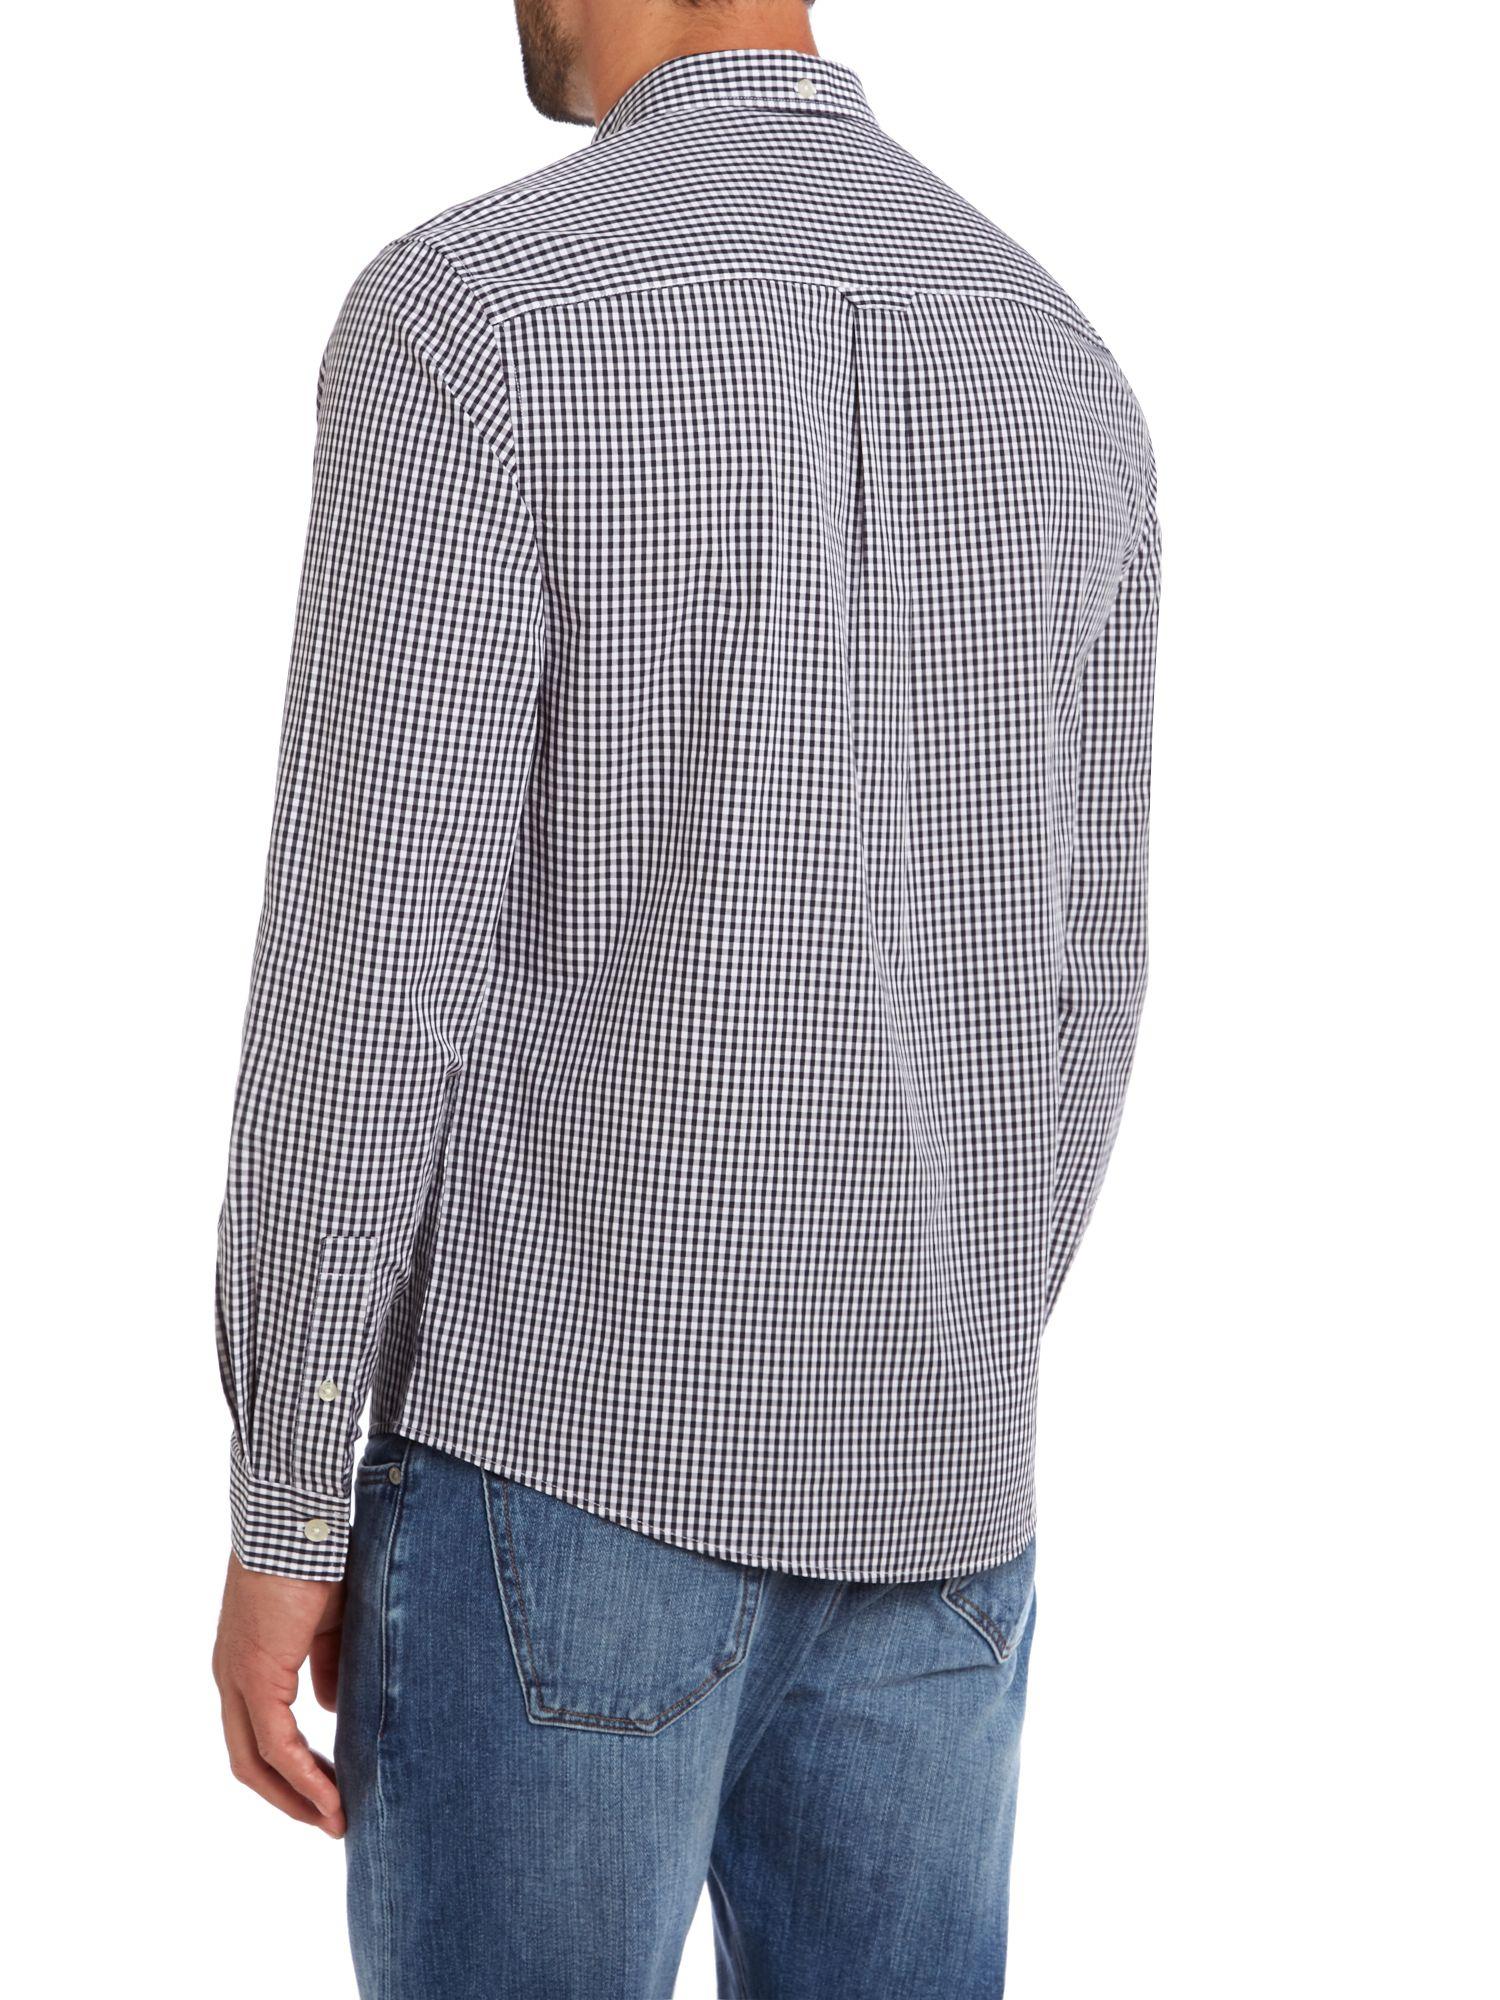 Lyle & Scott Cotton Long Sleeve Gingham Shirt in Navy (Blue) for Men